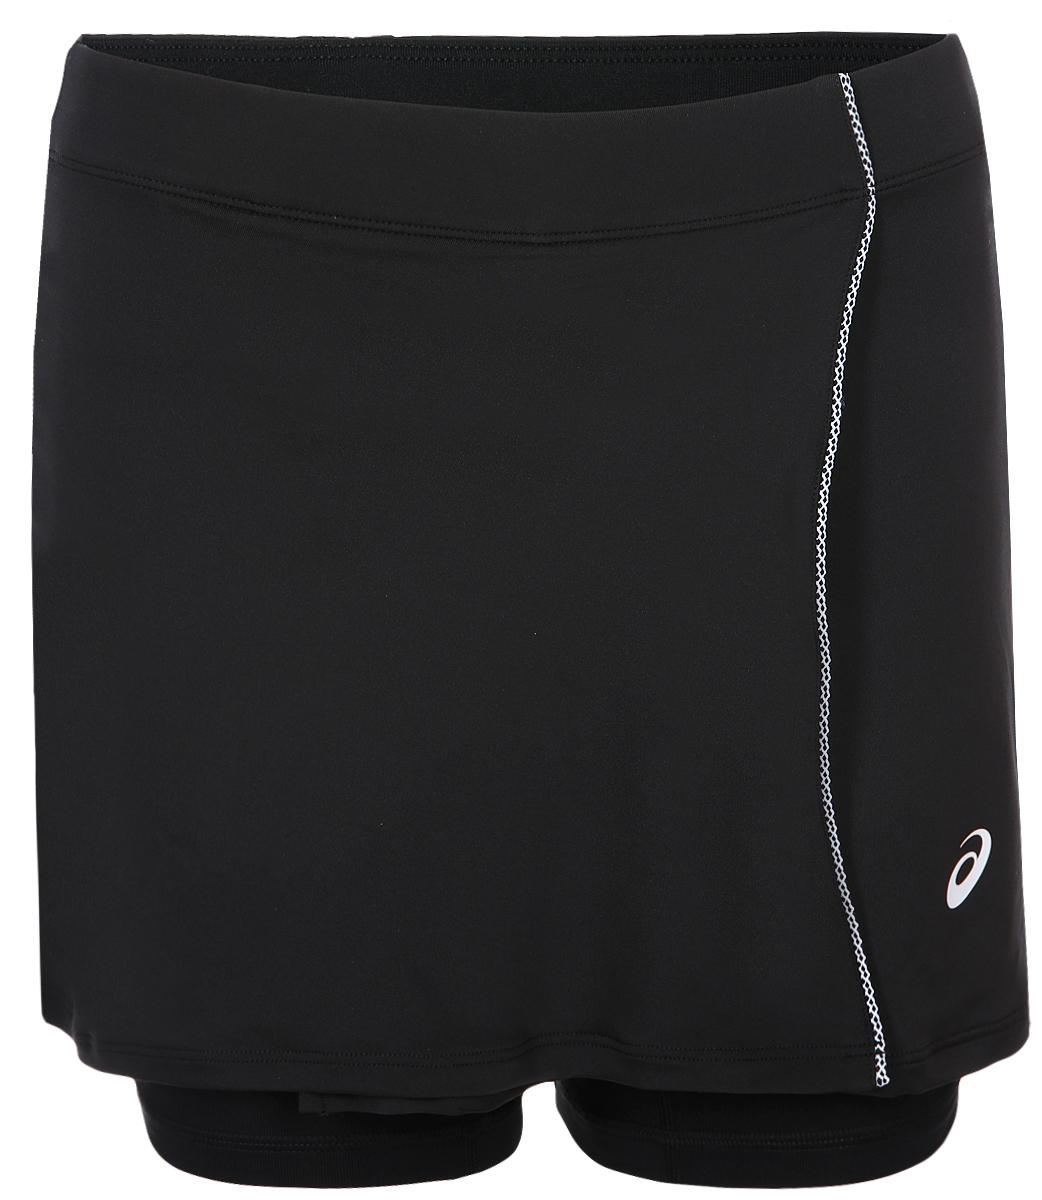 Asics Skort платье для тенниса asics w club dress цвет розовый синий 141173 0688 размер m 46 48